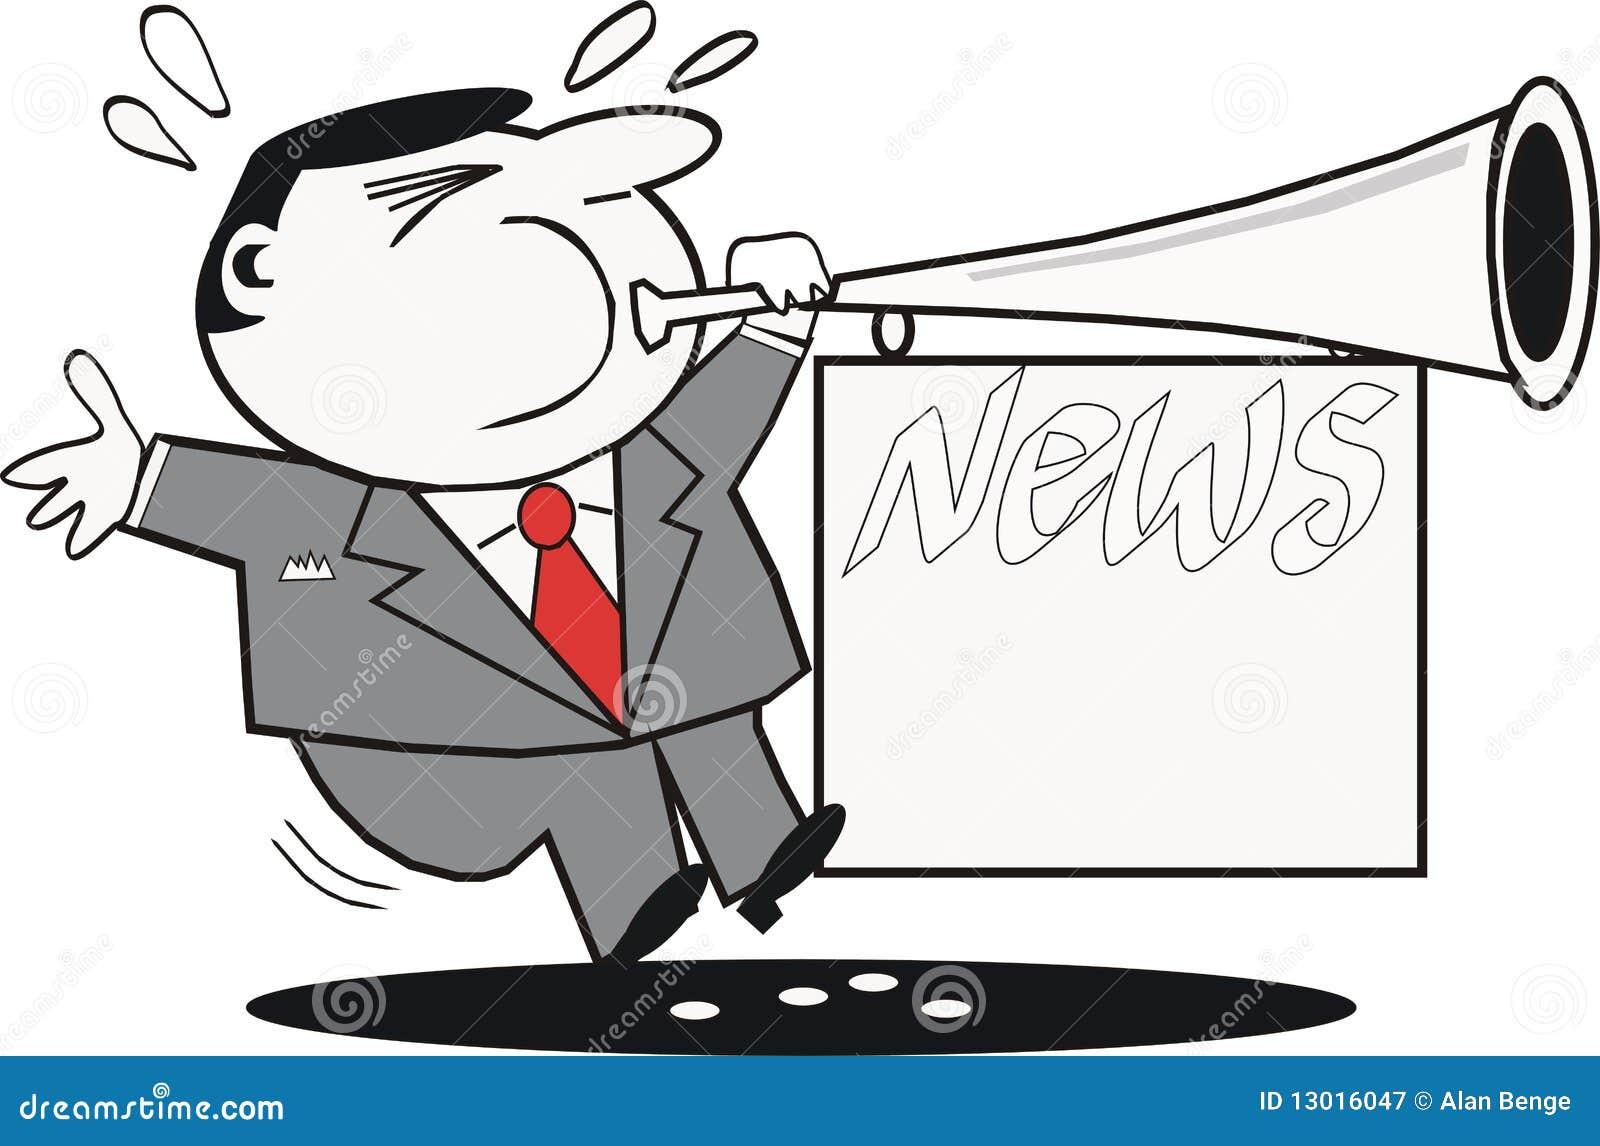 News Publicity Cartoon Royalty Free Stock Photography ...